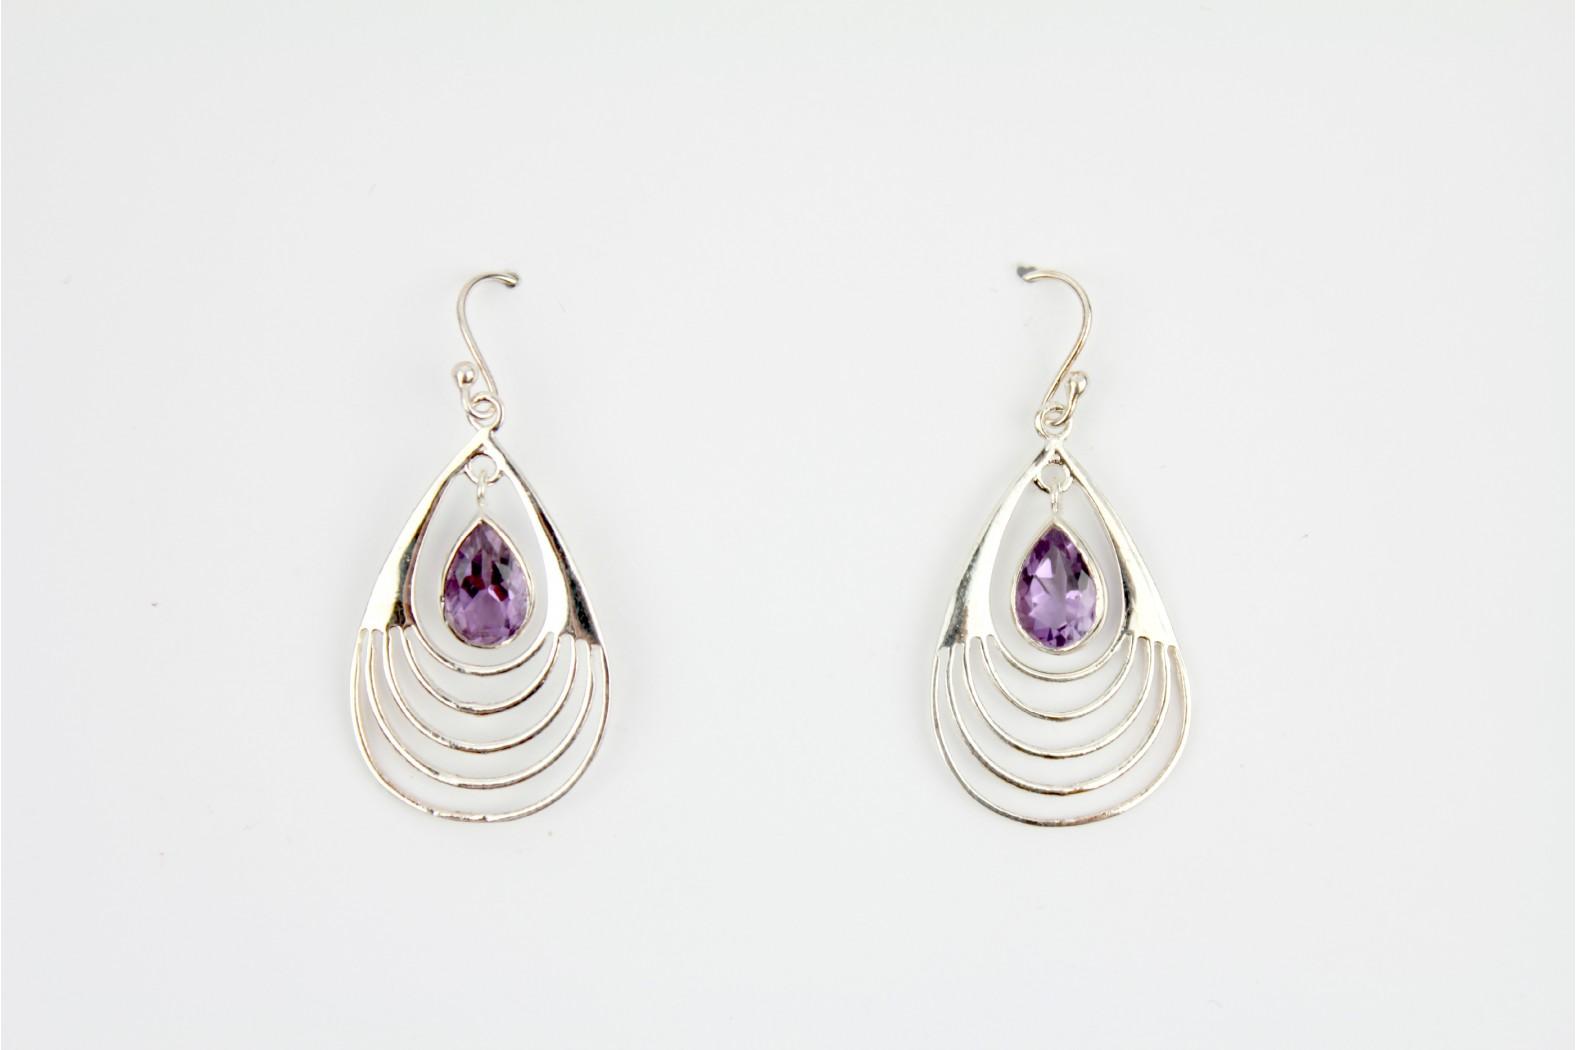 Large Tear Drop shape contemporary style Amethyst Stone earrings.